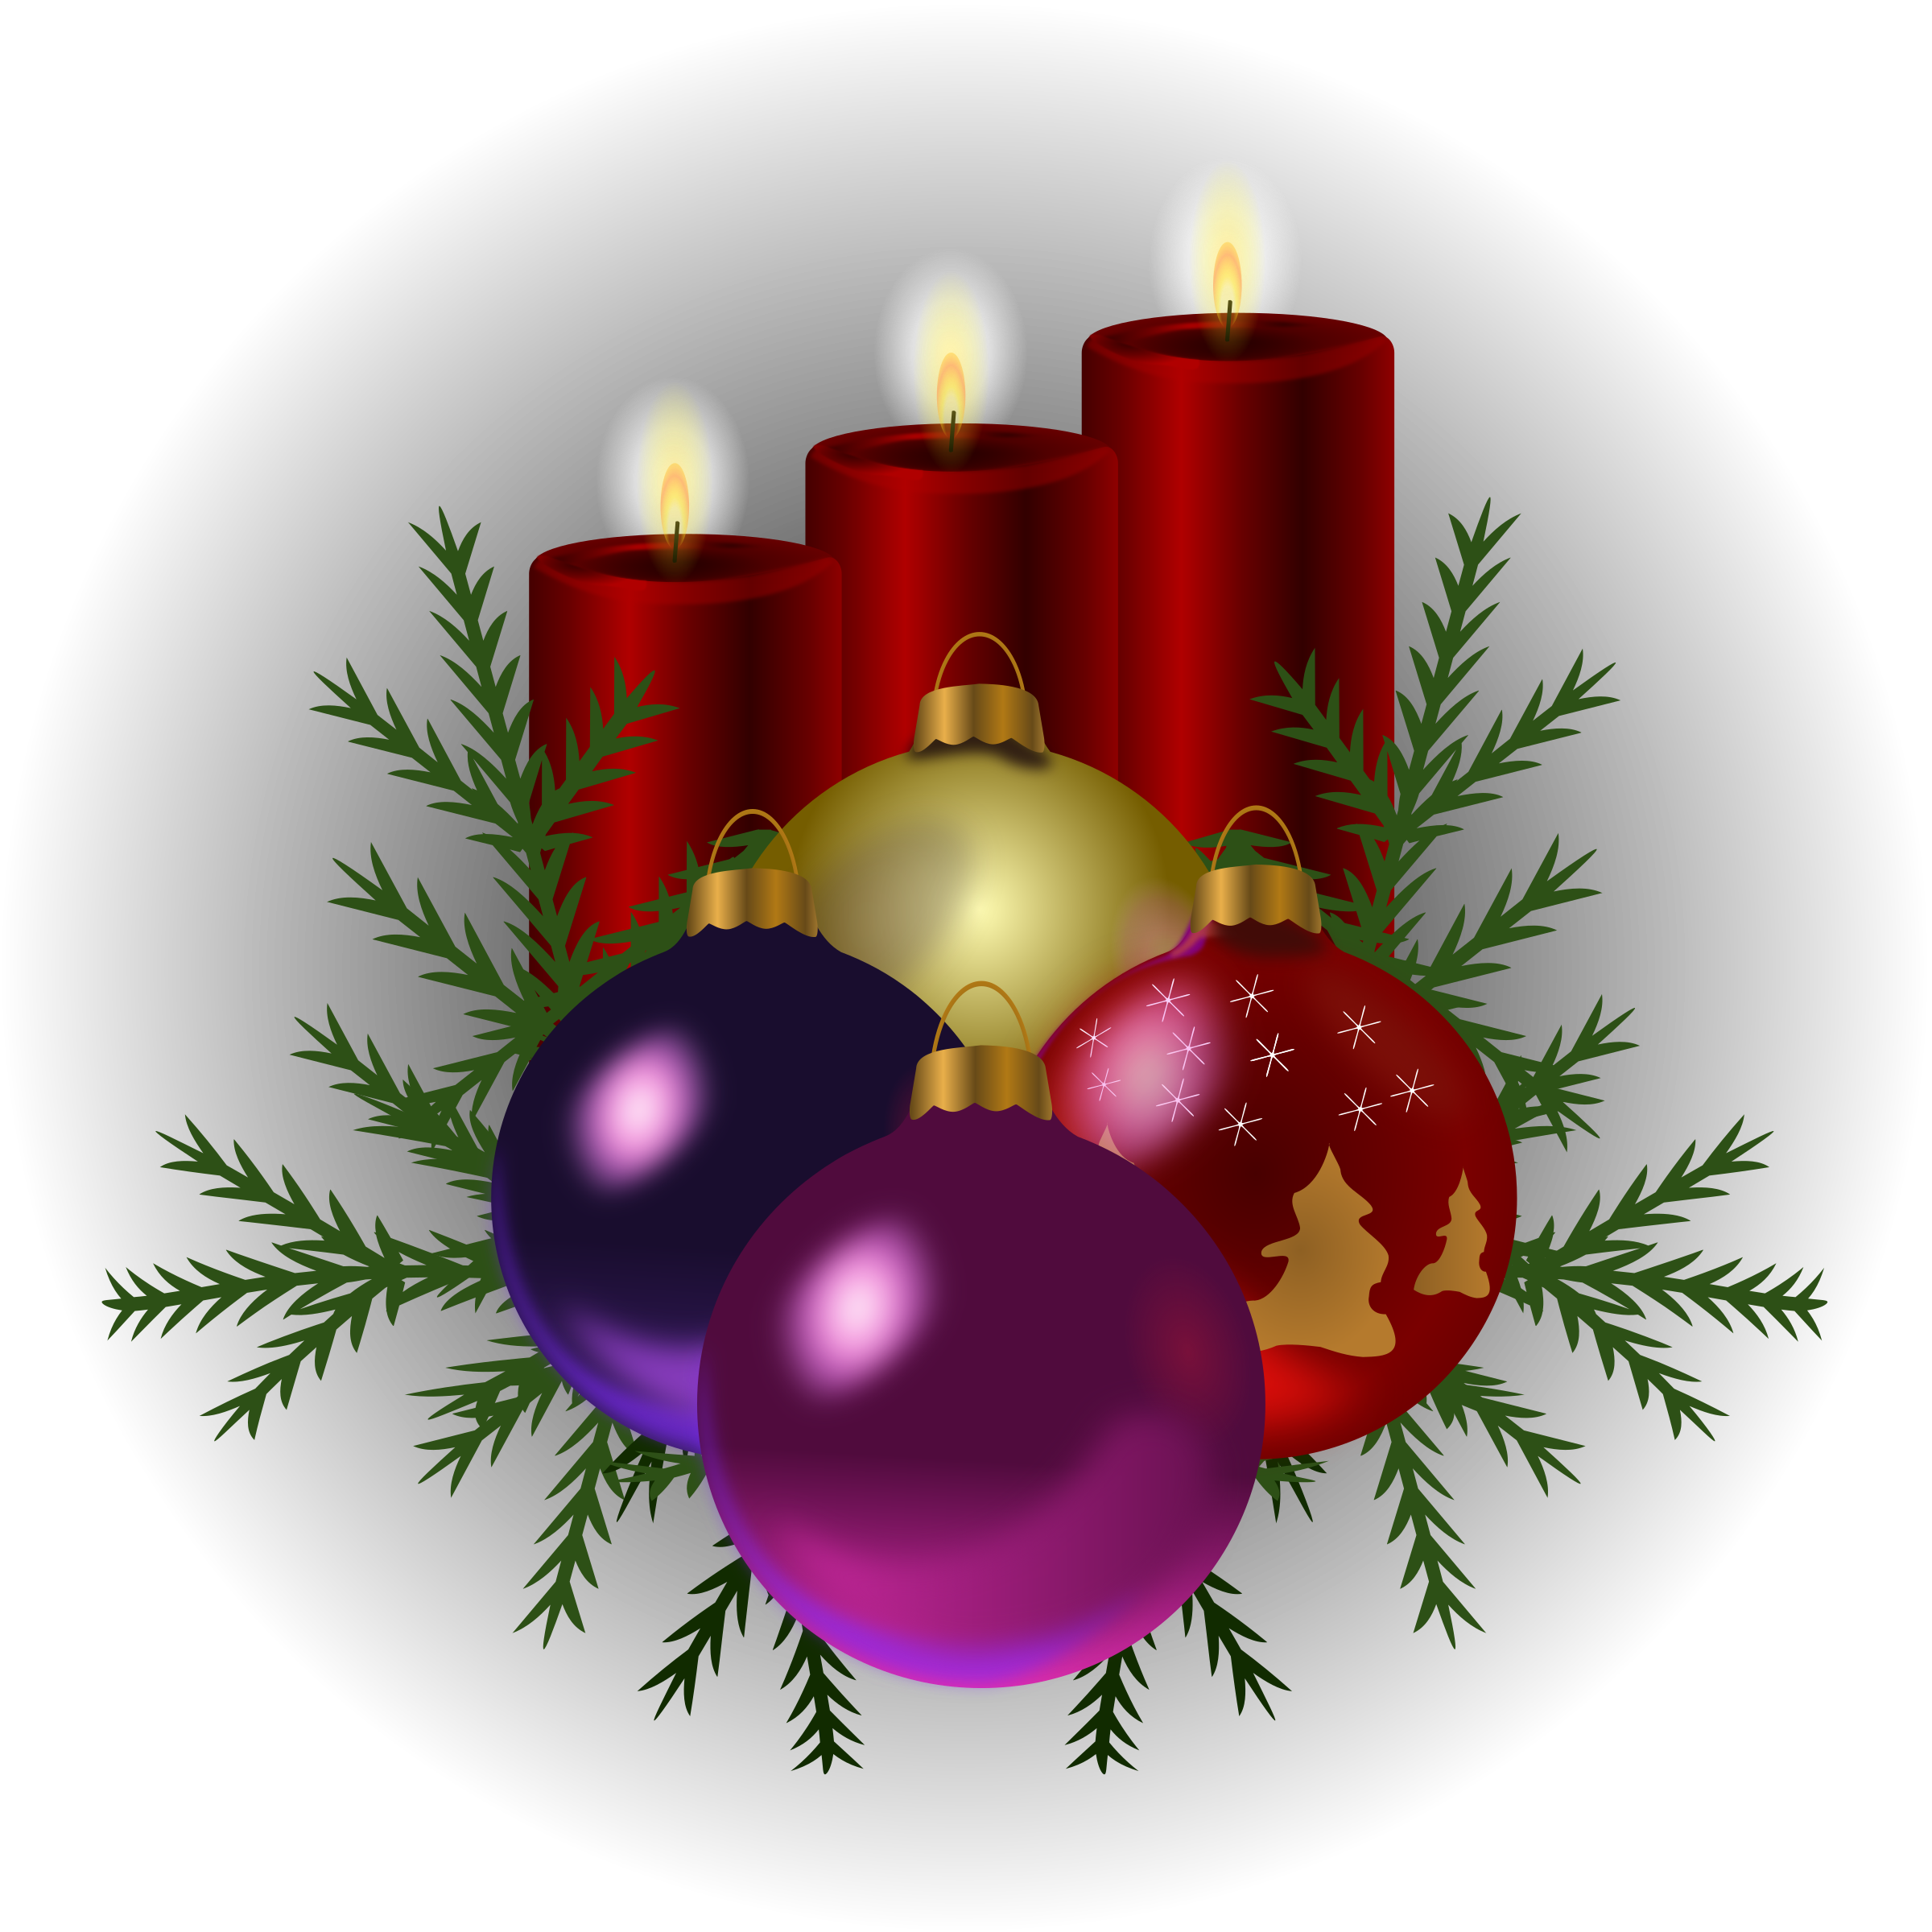 Clipart toys xmas. Christmas tree big image